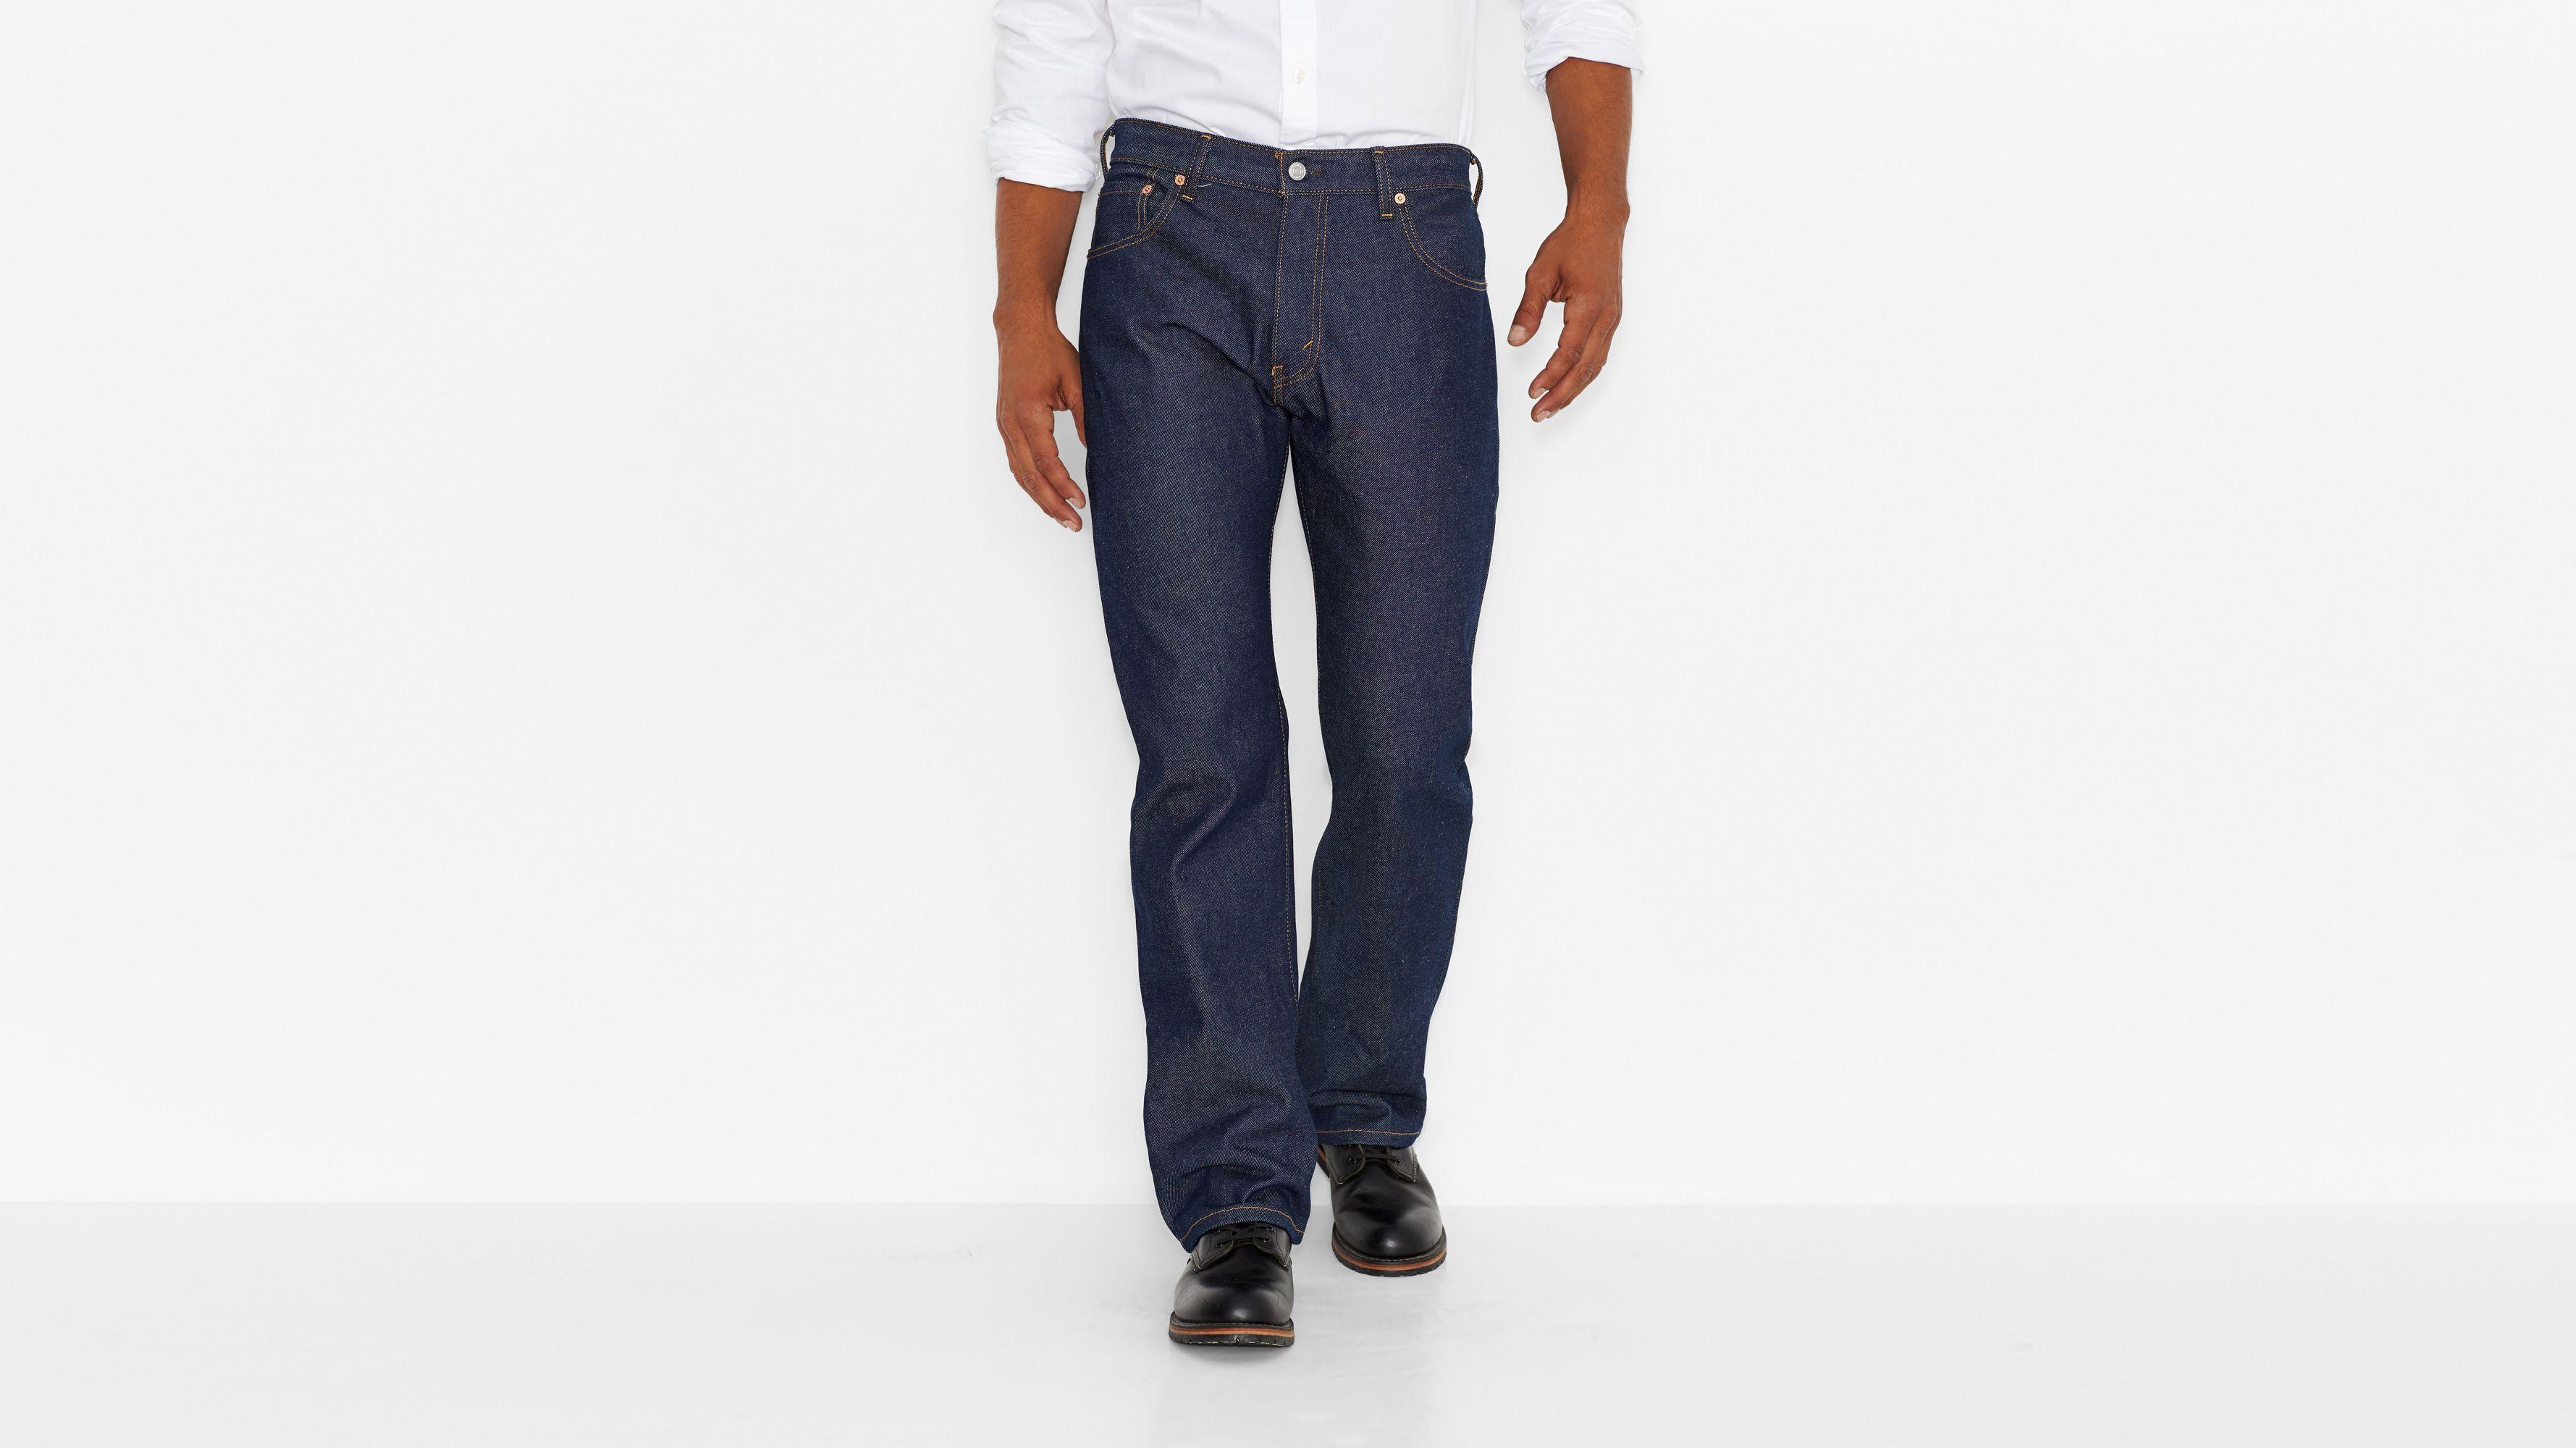 517™ Boot Cut Jeans - Rigid